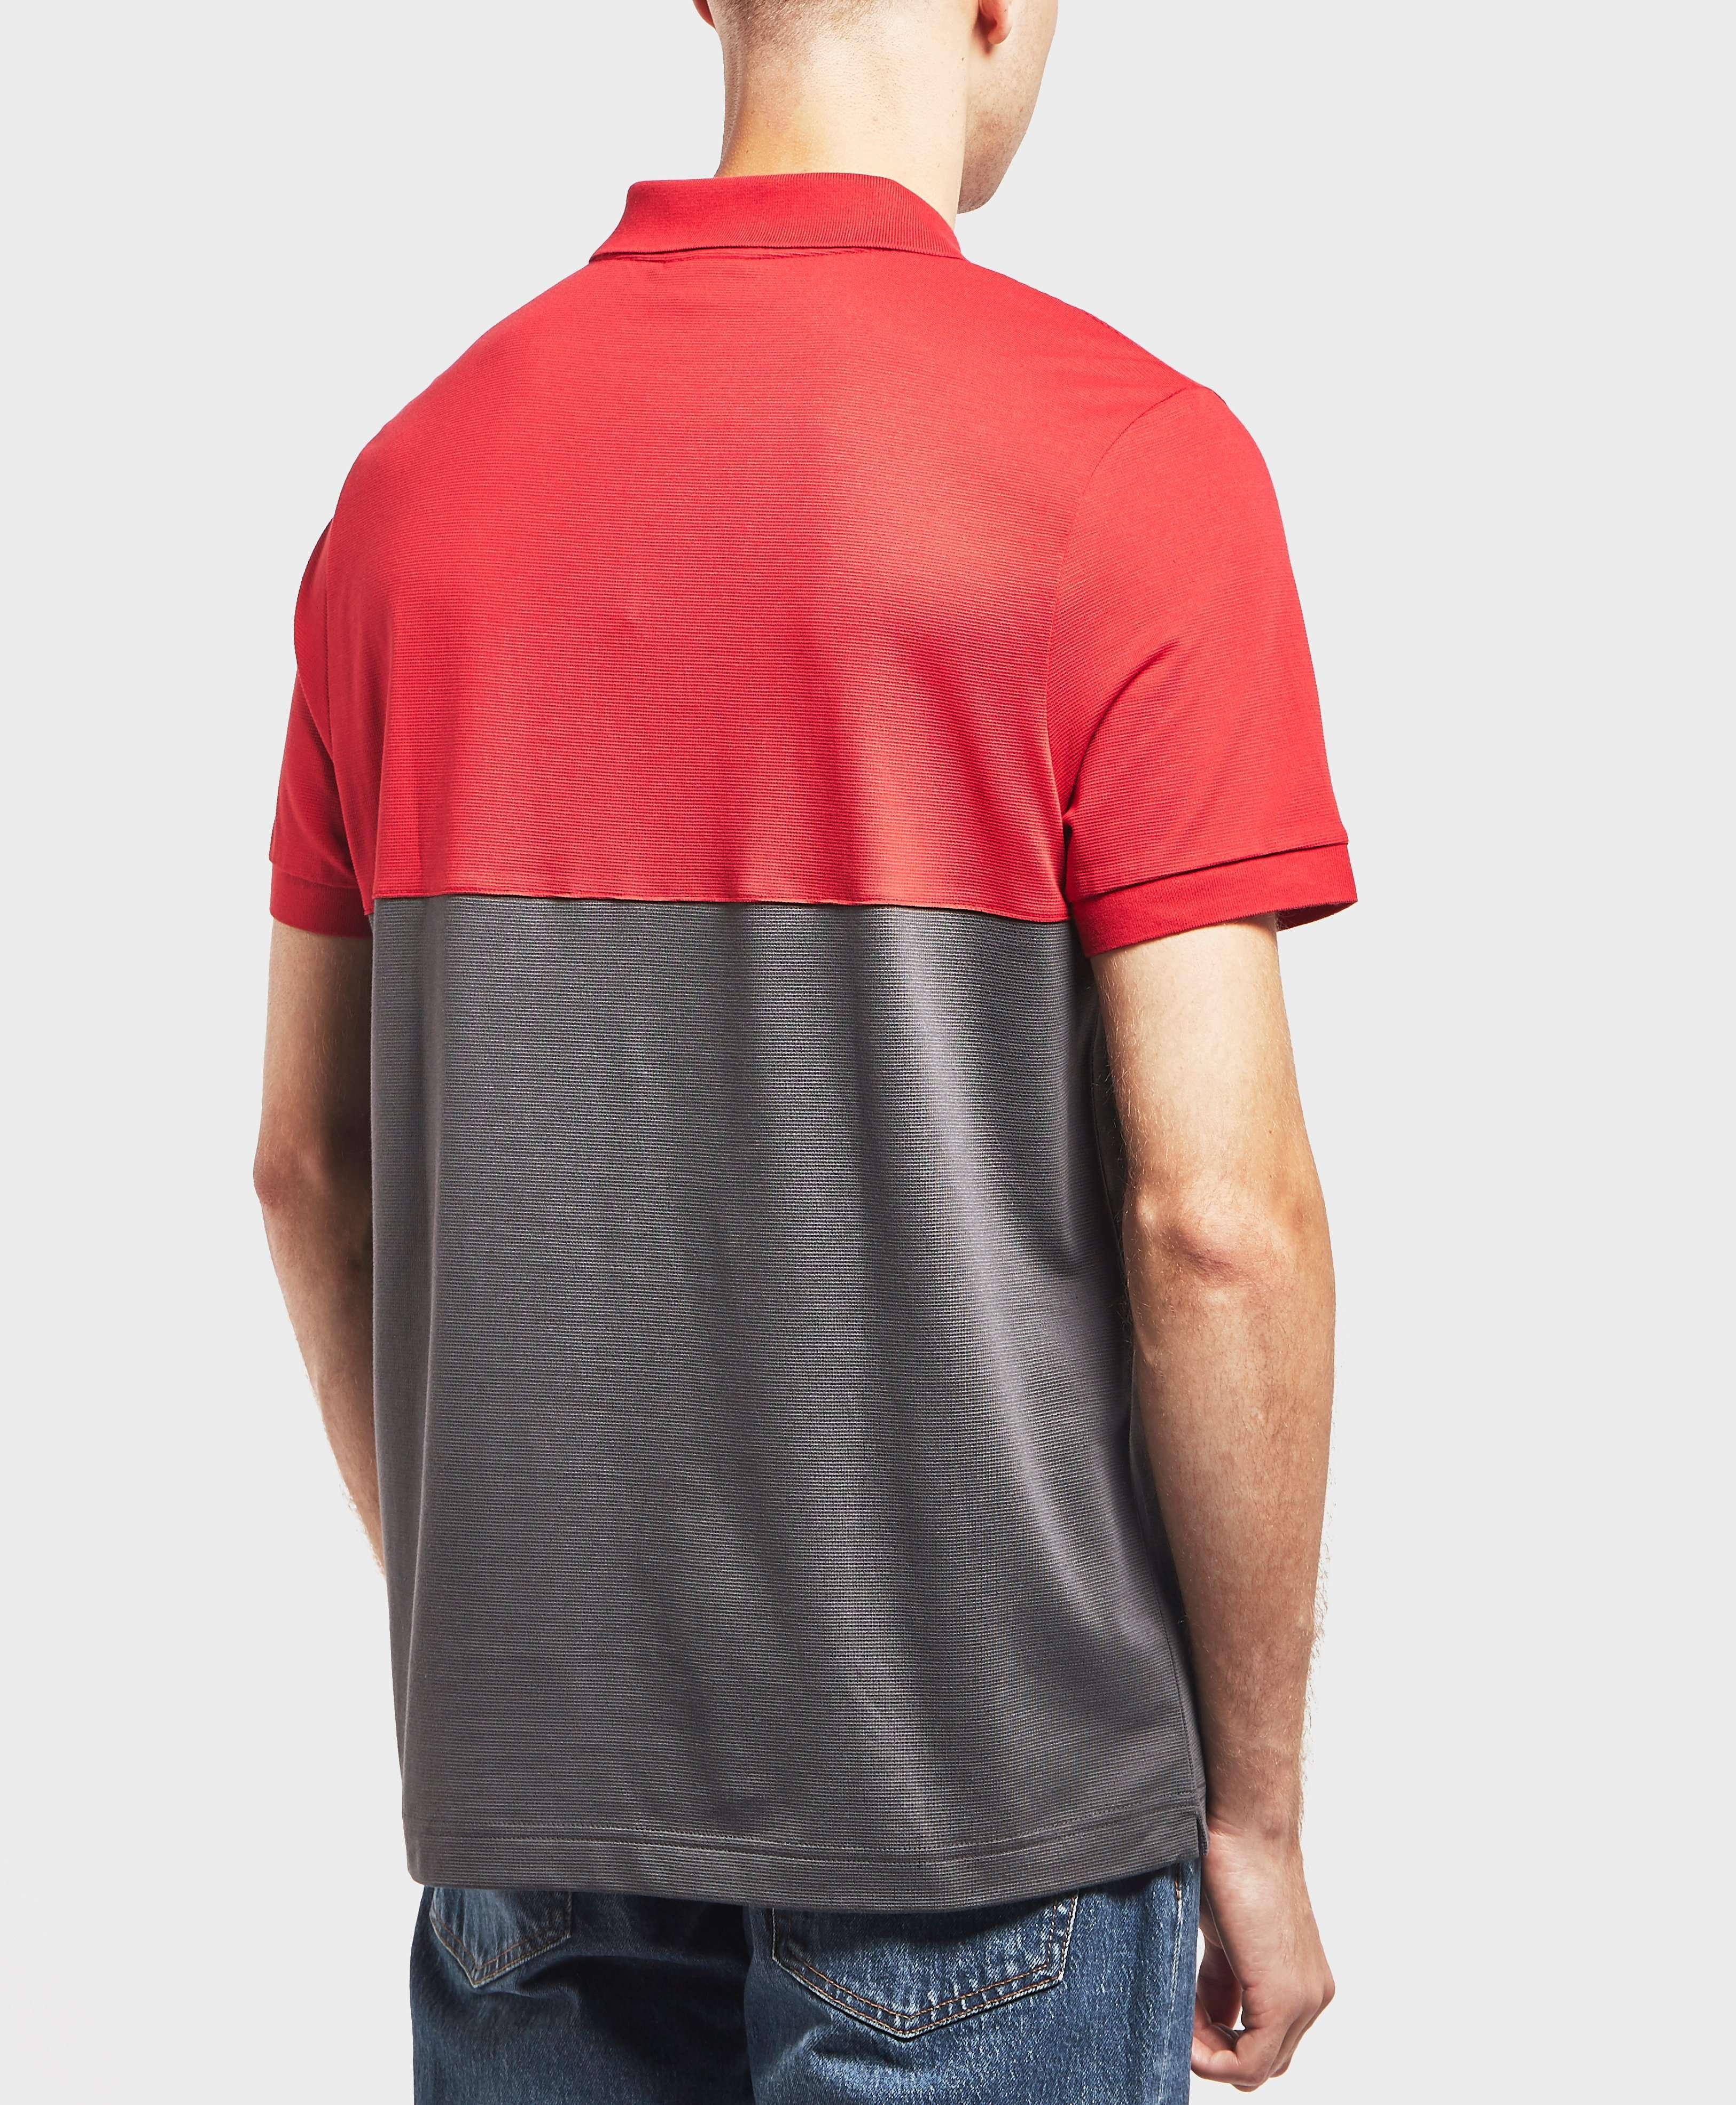 Lacoste Block Short Sleeve Polo Shirt